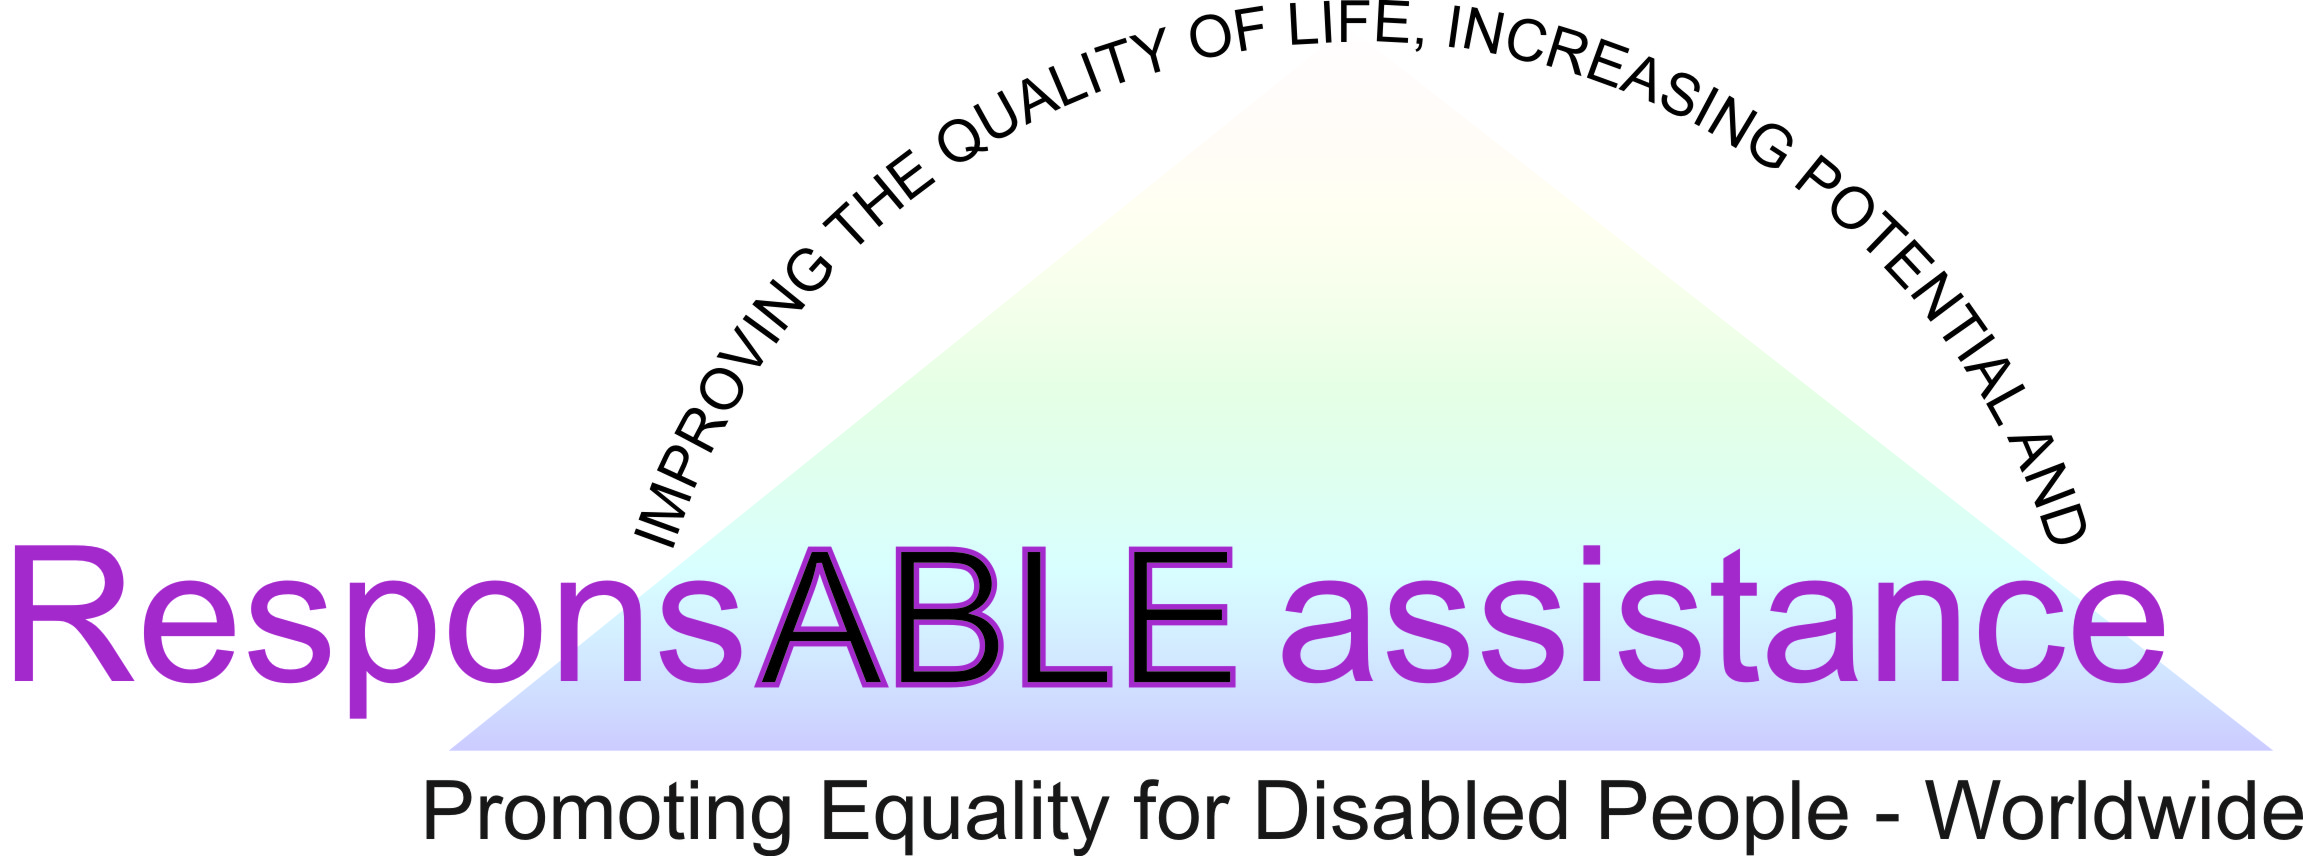 ResponsABLE assistance